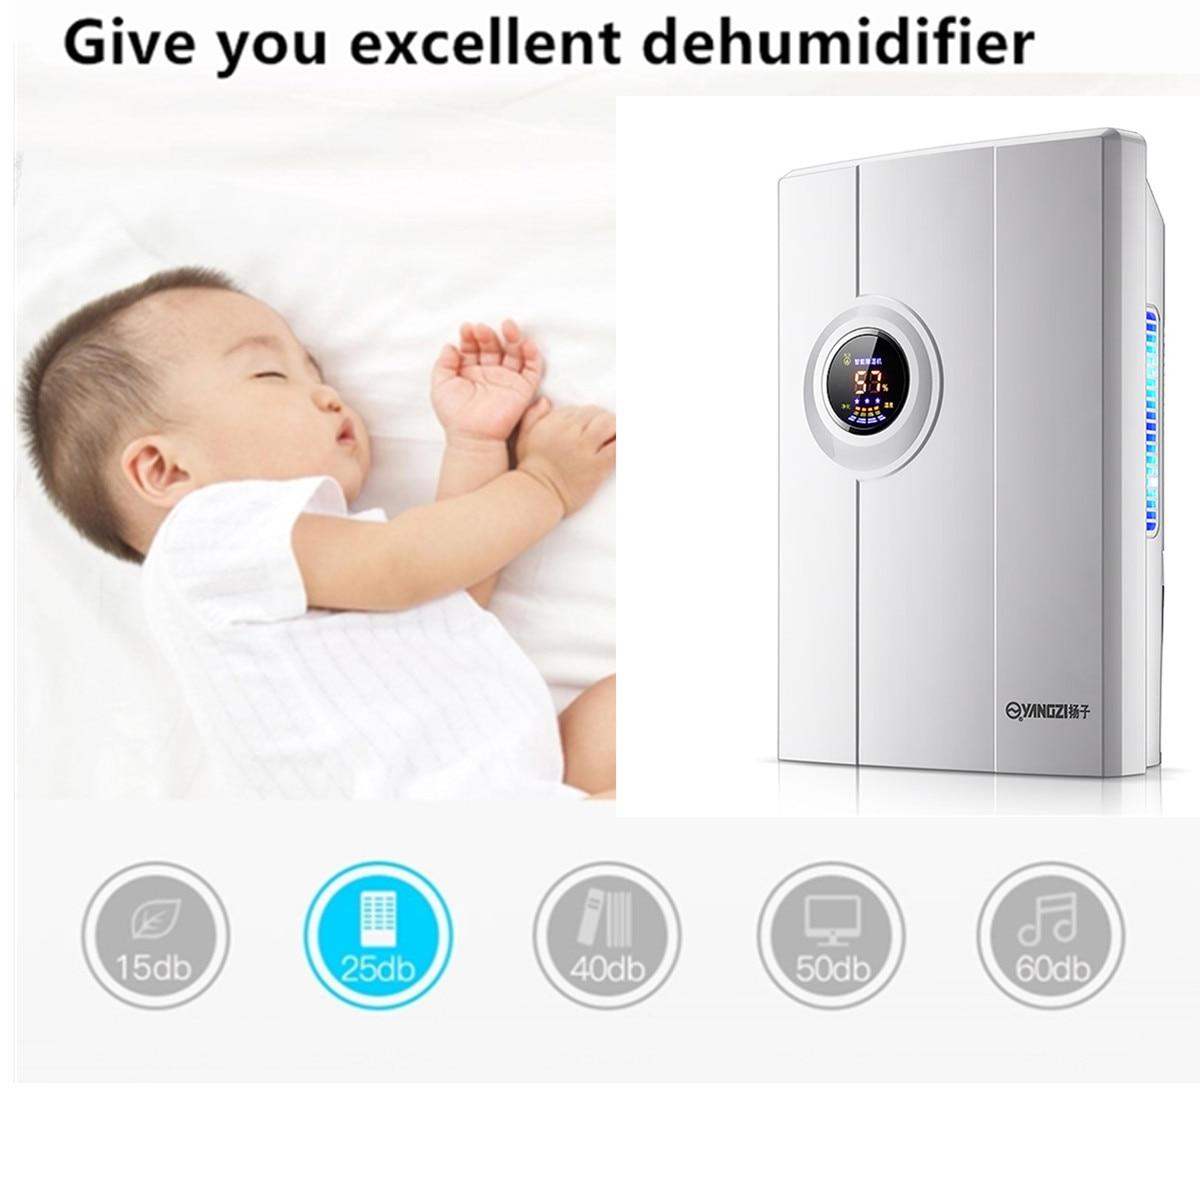 2.2L Air Dehumidifier Mini Air Dryer Temperature Moisture Display Semiconductor Desiccant Absorber Car Home Electric Machine